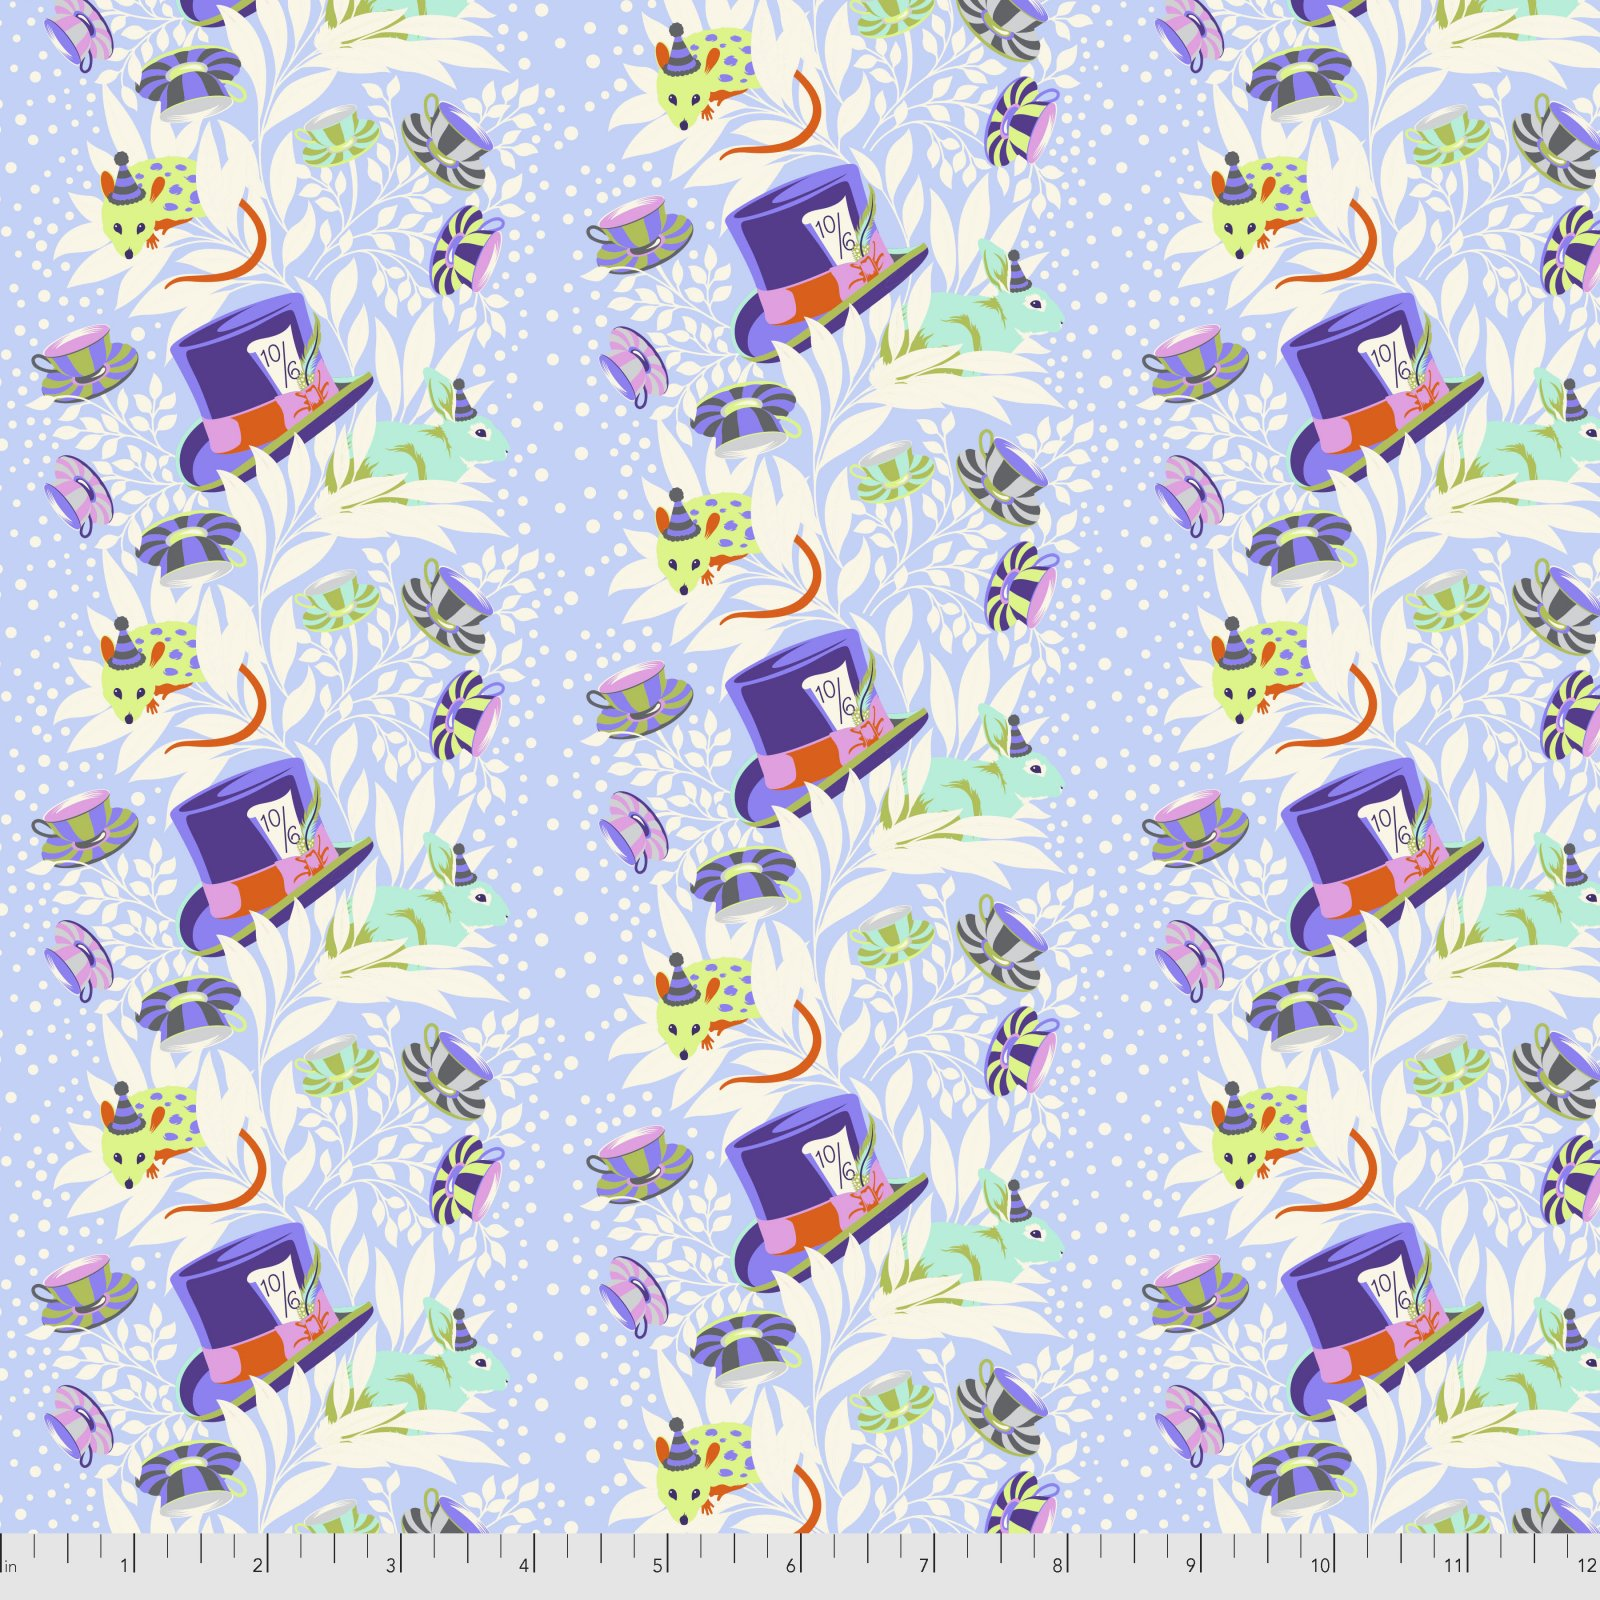 Curiouser & Curiouser 165 DAYDREAM